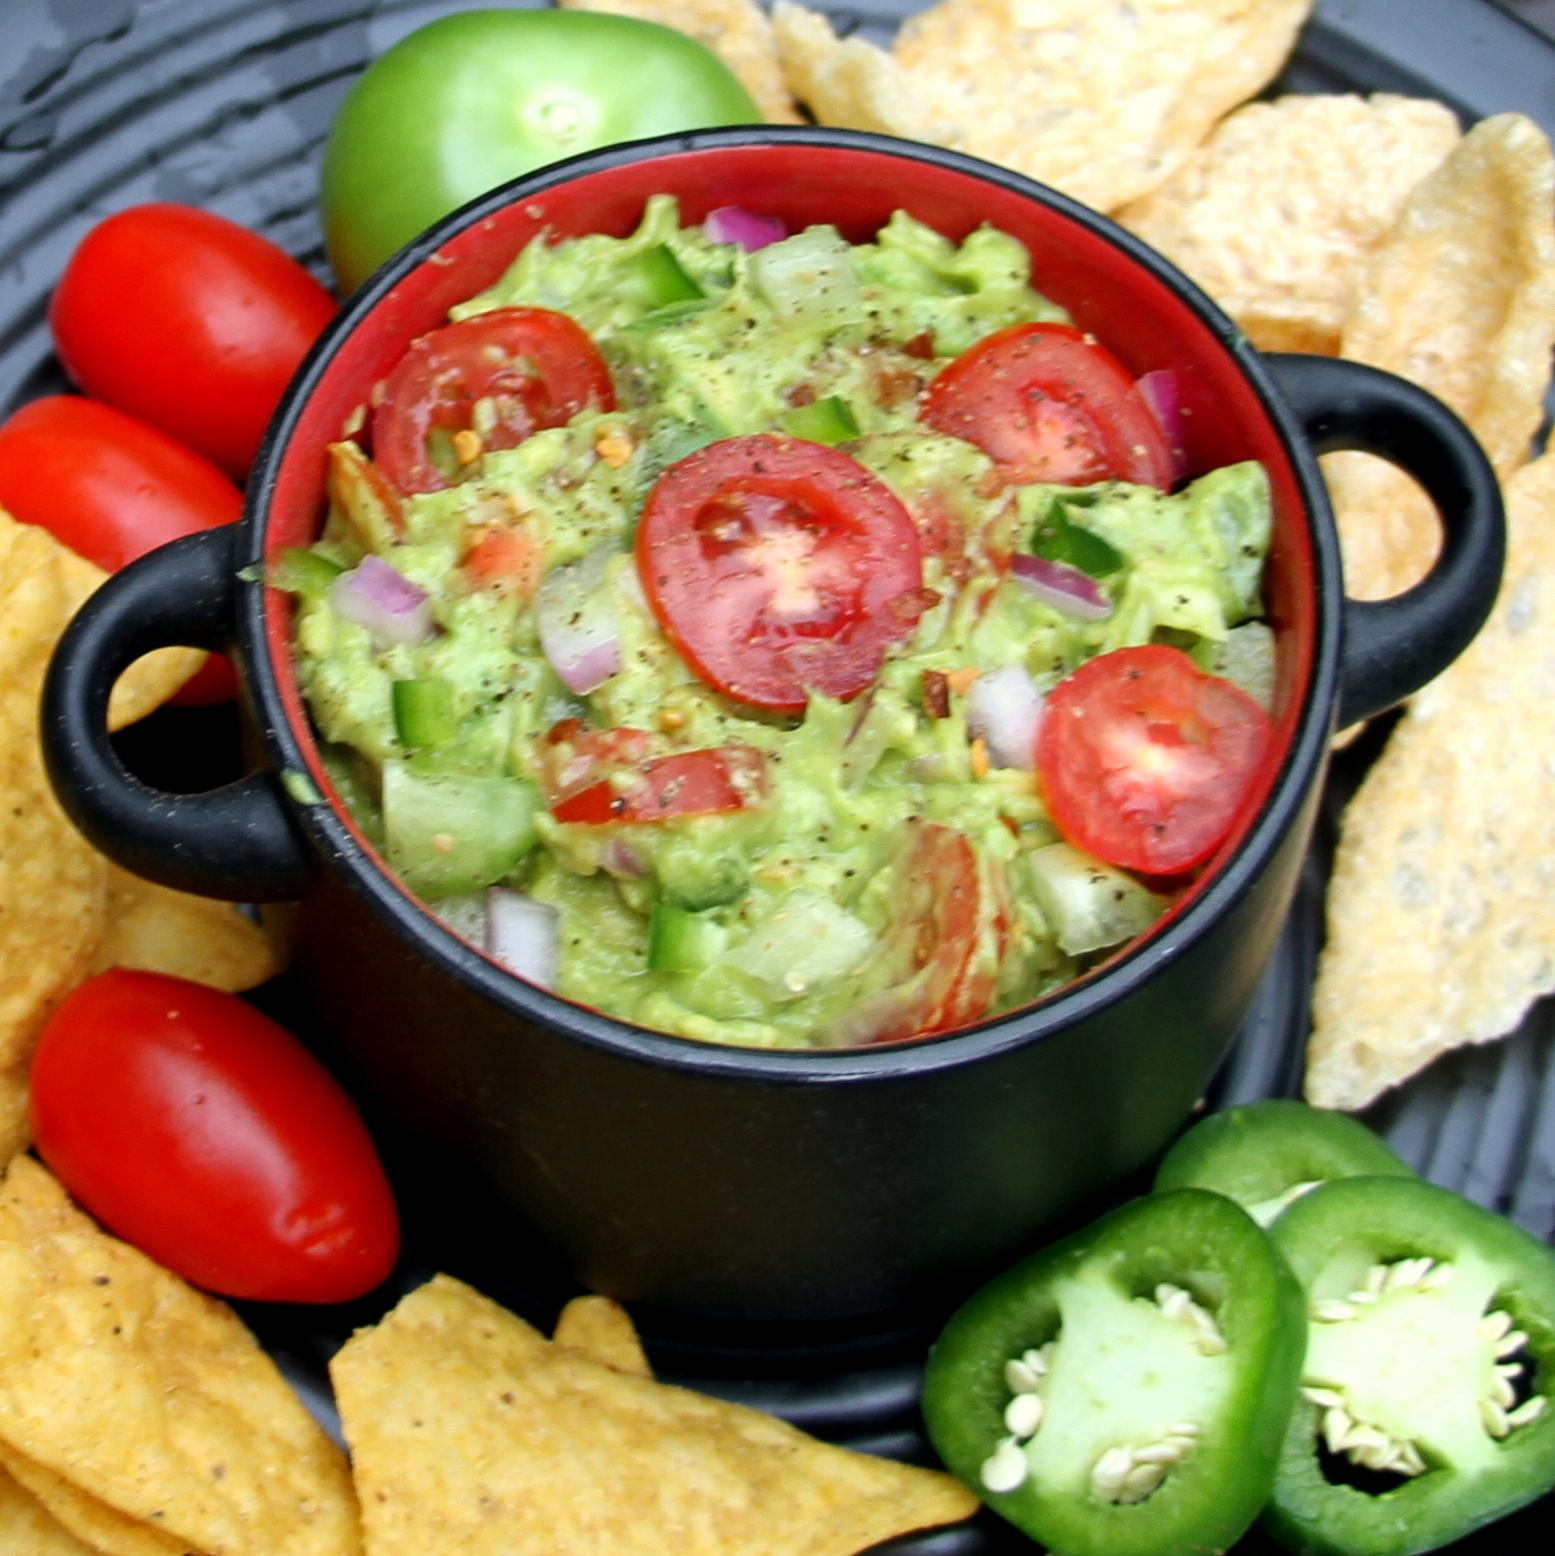 Tomatillo Guacamole